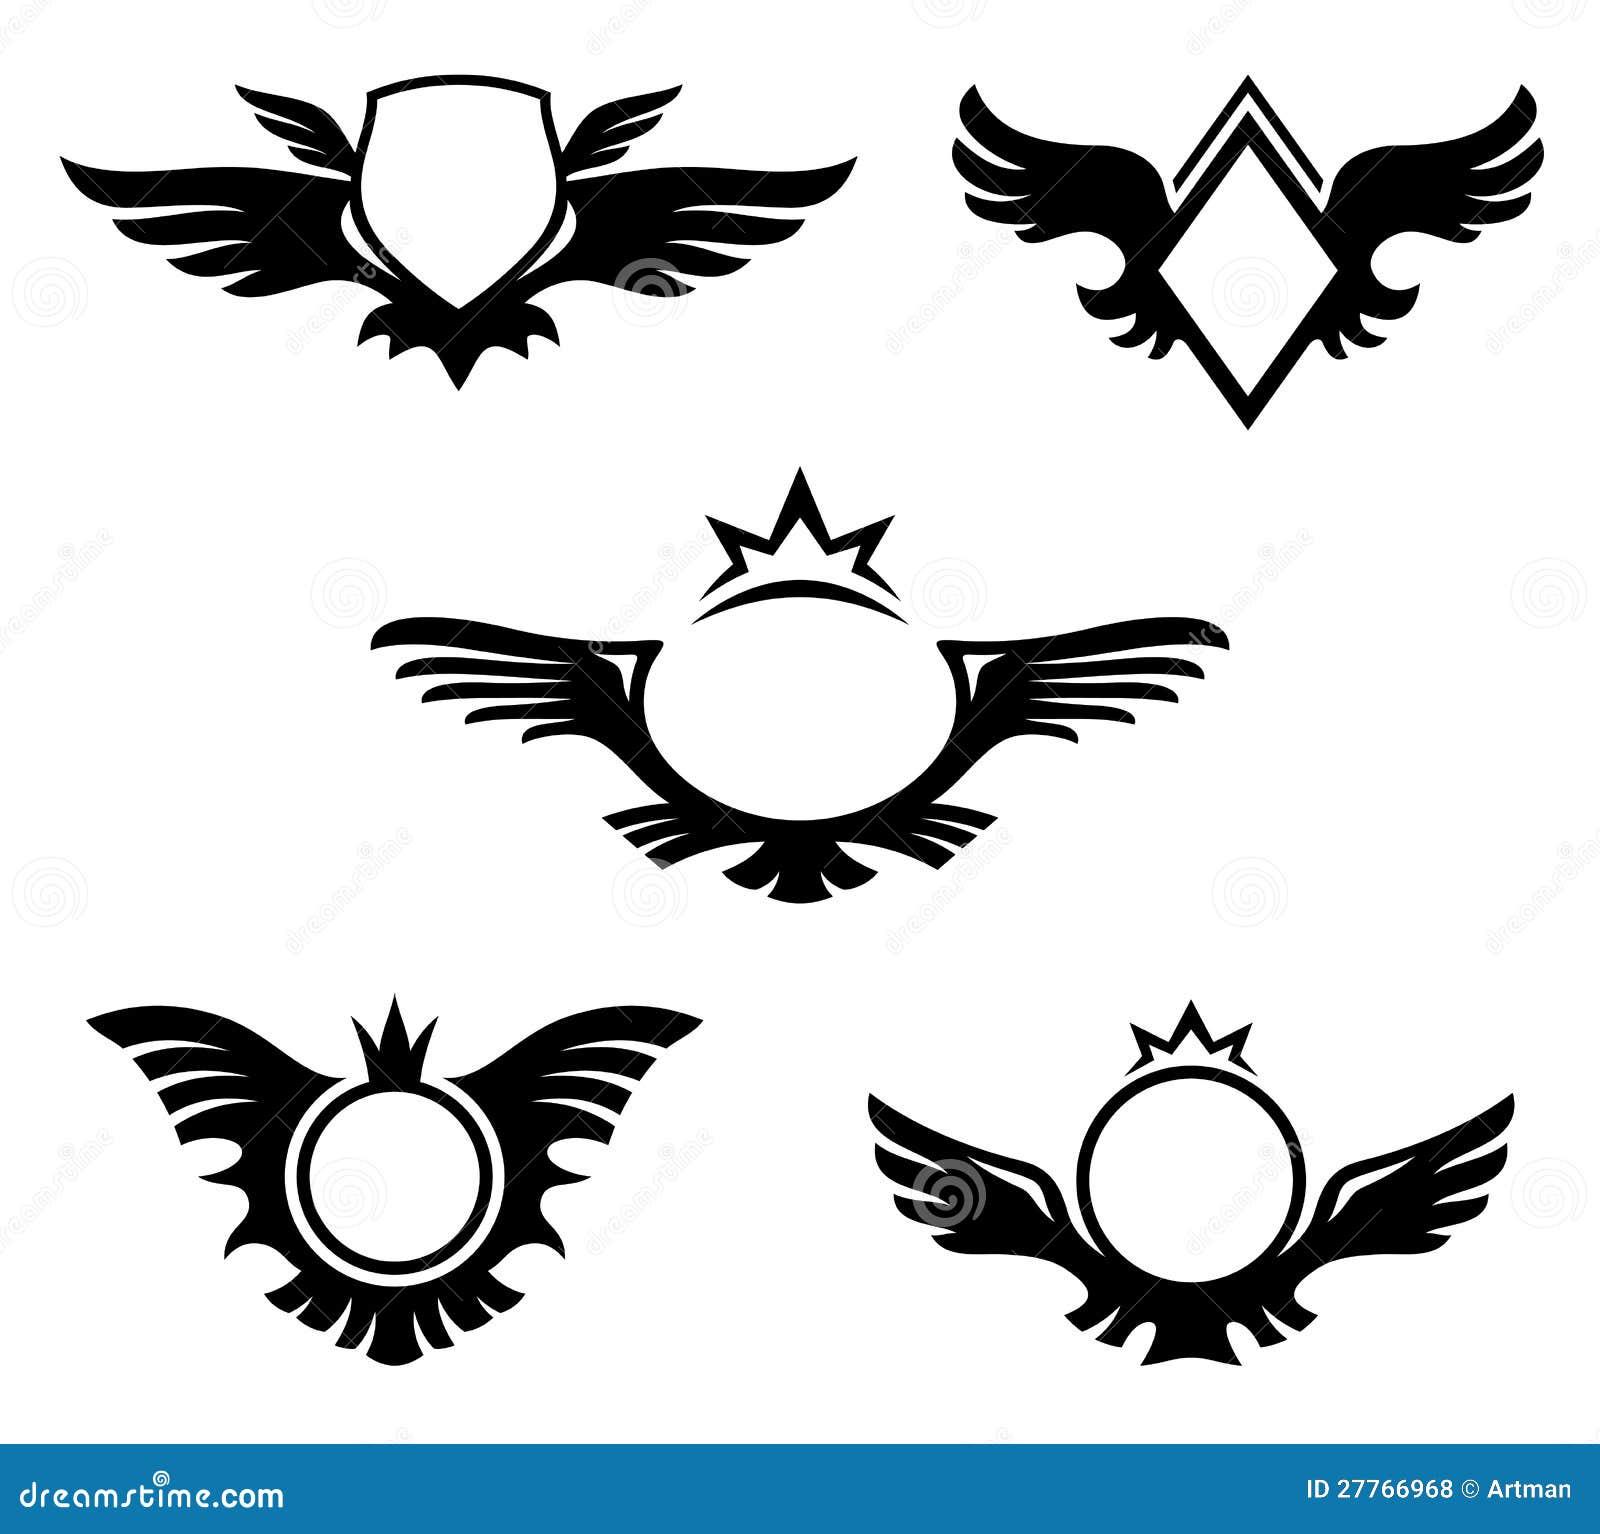 blank emblem logo wwwpixsharkcom images galleries